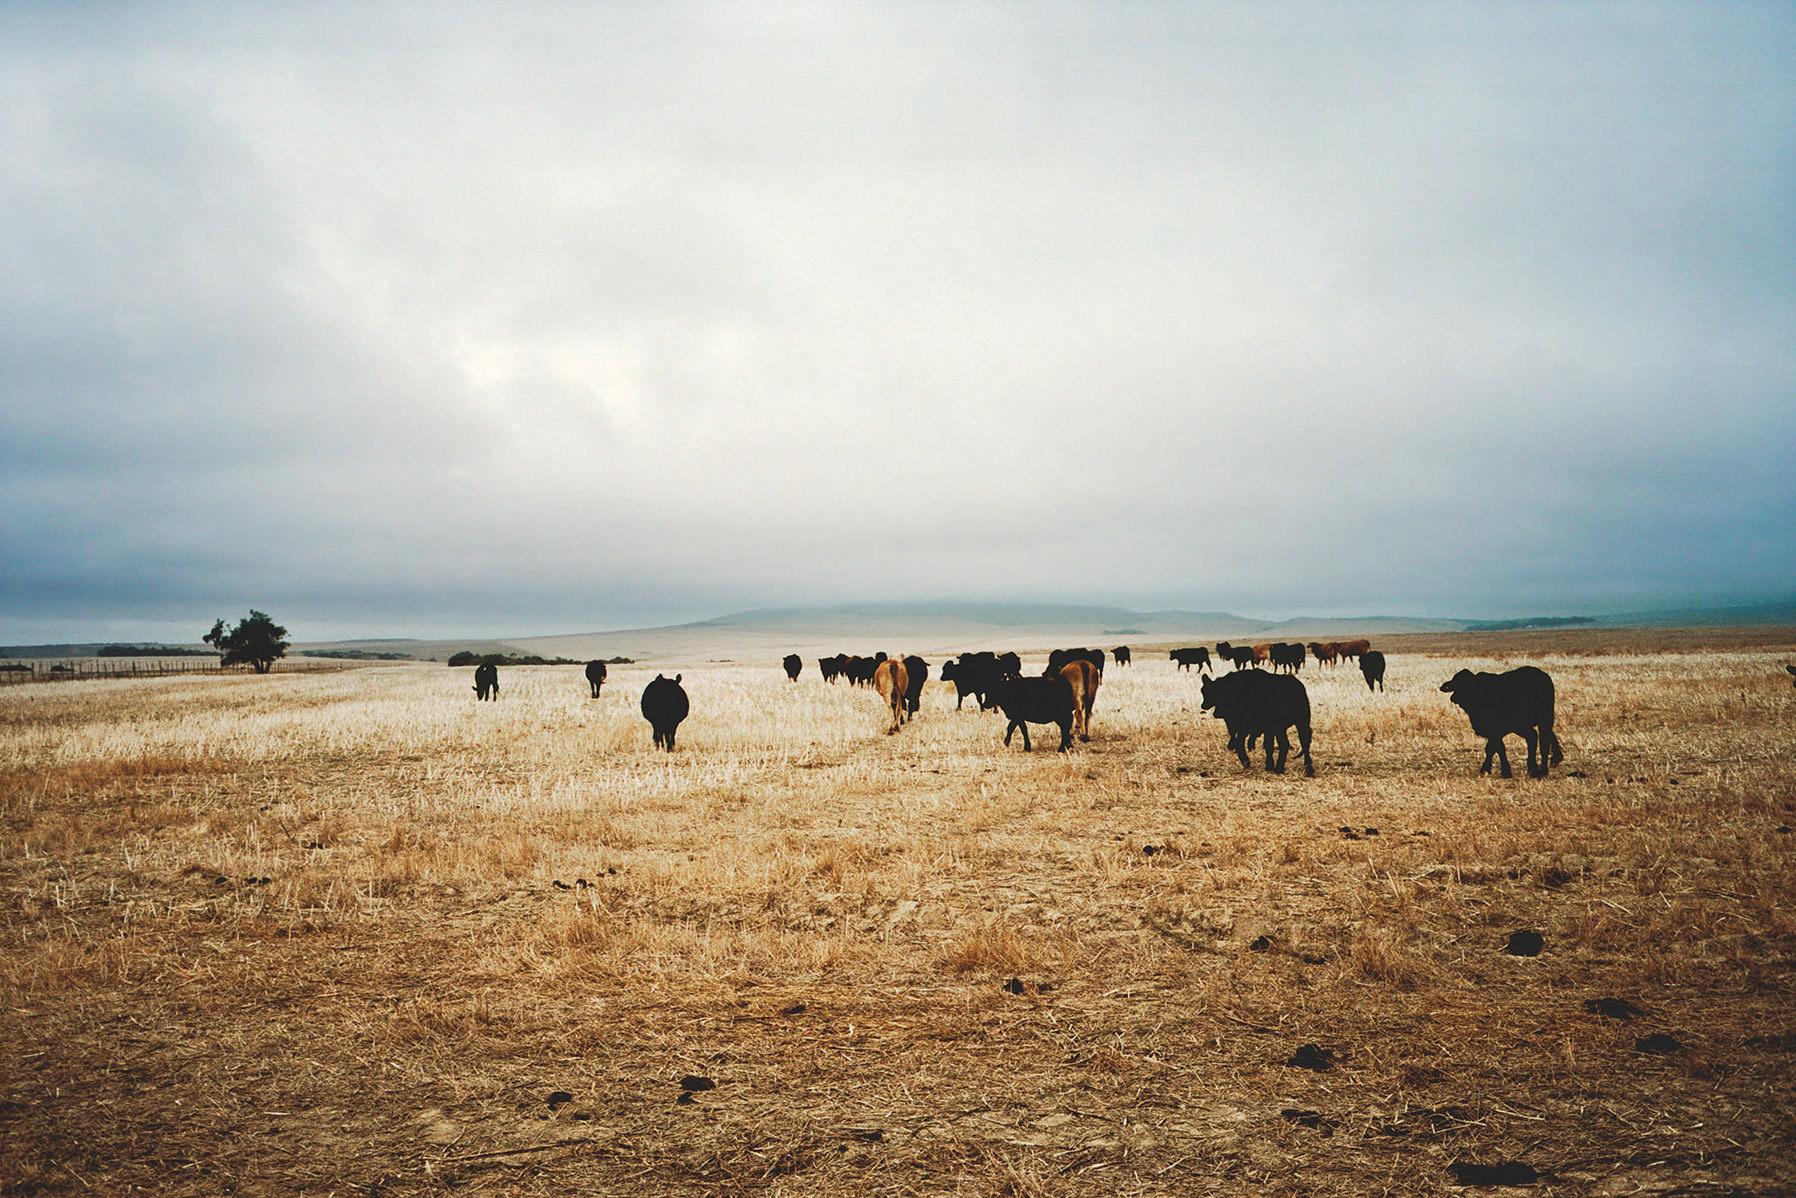 352_23-Florian-Lierzer-Landscape-South-Africa-OR